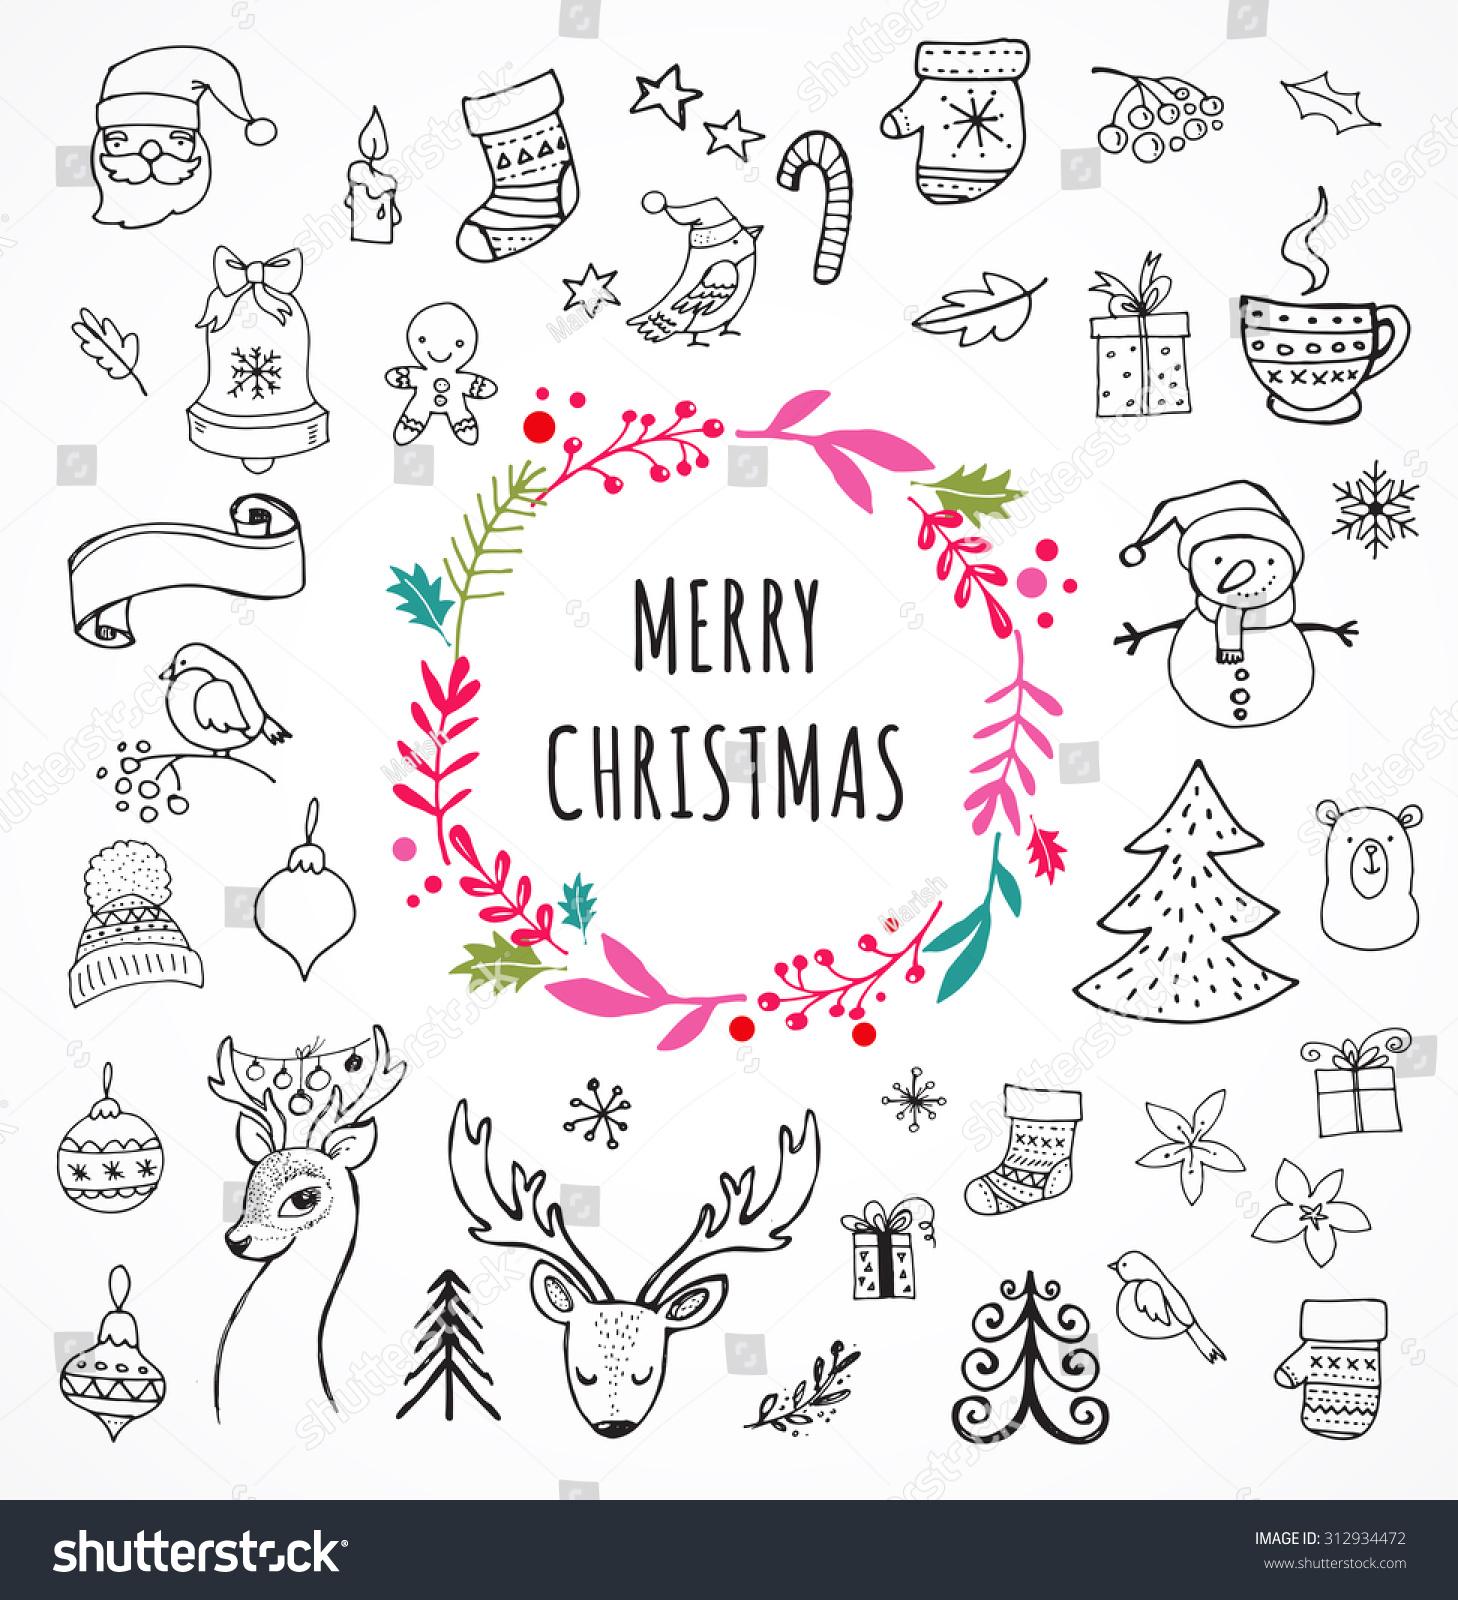 Merry christmas doodle xmas symbols hand stock vector 312934472 merry christmas doodle xmas symbols hand drawn illustrations sketches biocorpaavc